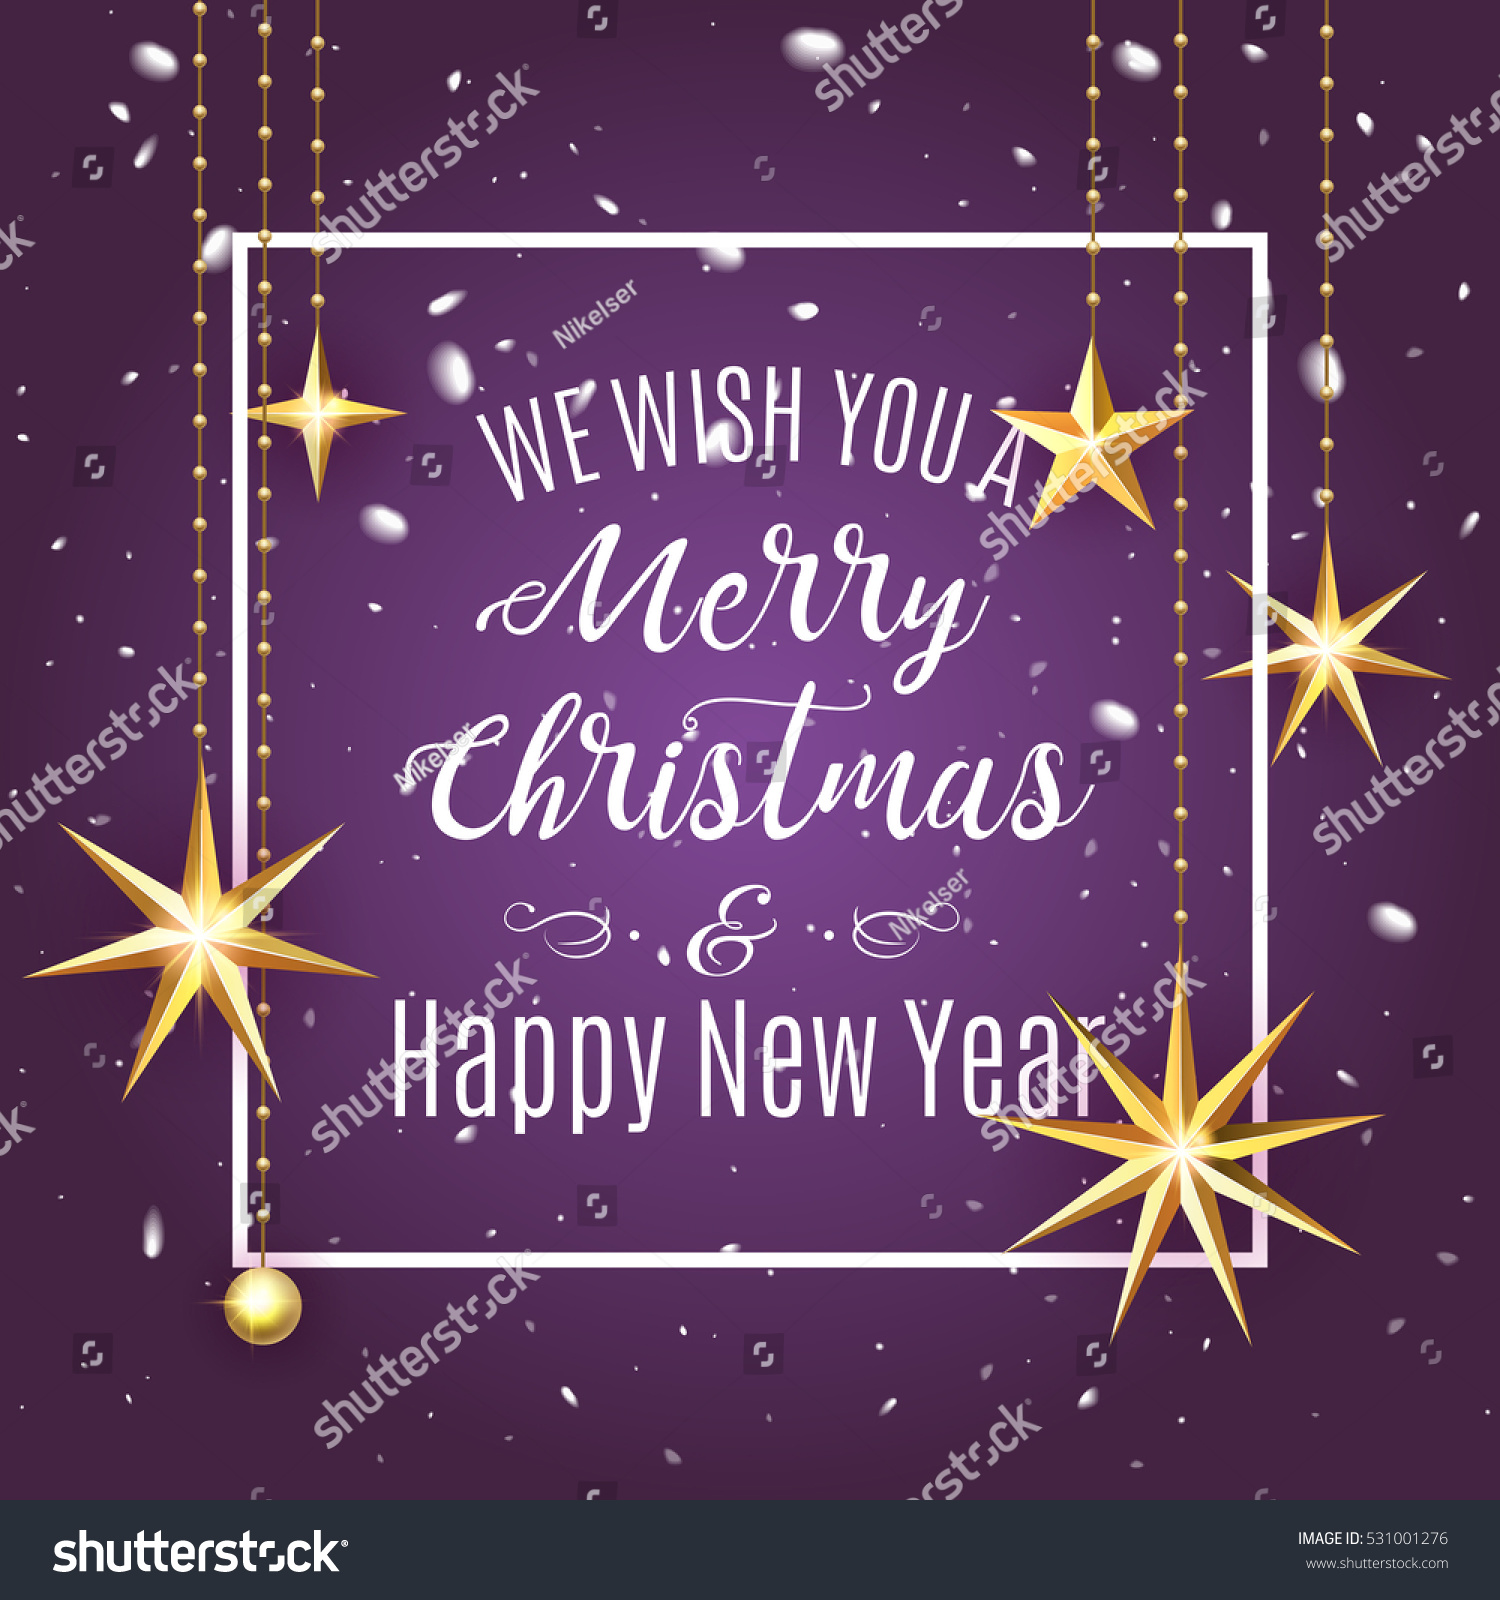 Premium Luxury Merry Christmas Holiday Greeting Stock Vector